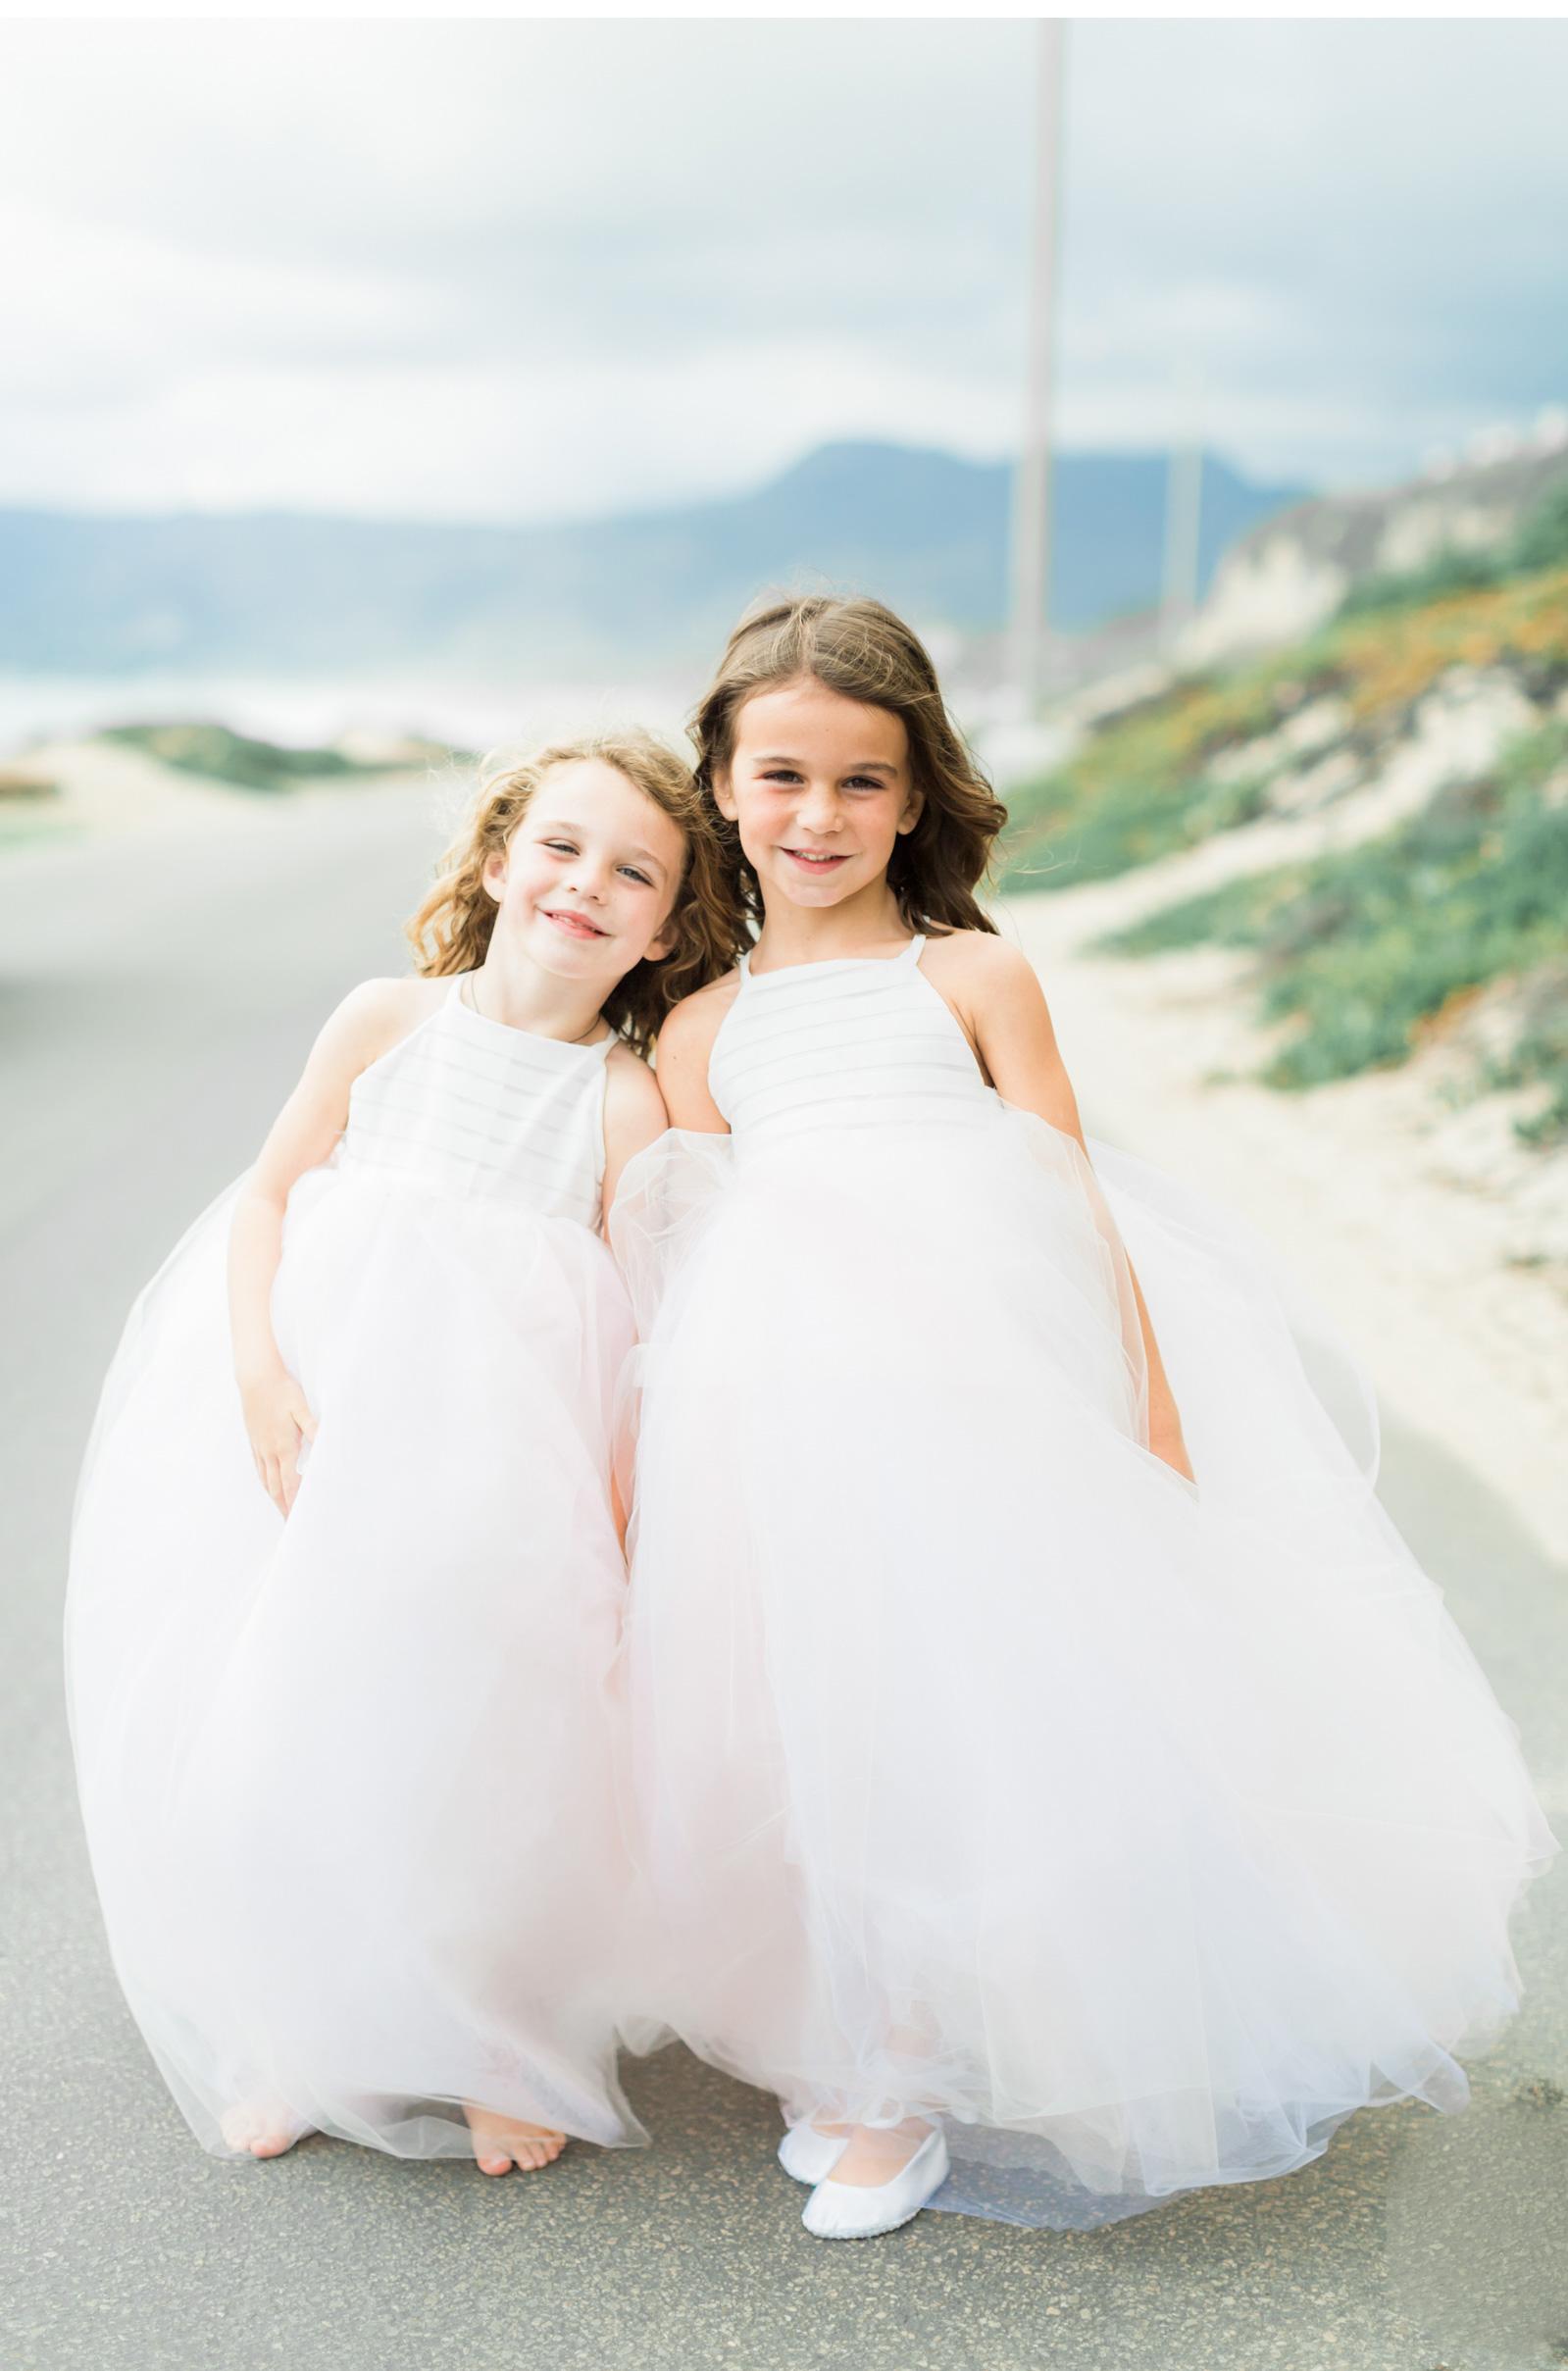 Rod-and-Lorin-Brewster-Style-Me-Pretty-Malibu-Beach-Wedding-Natalie-Schutt-Photography_05.jpg